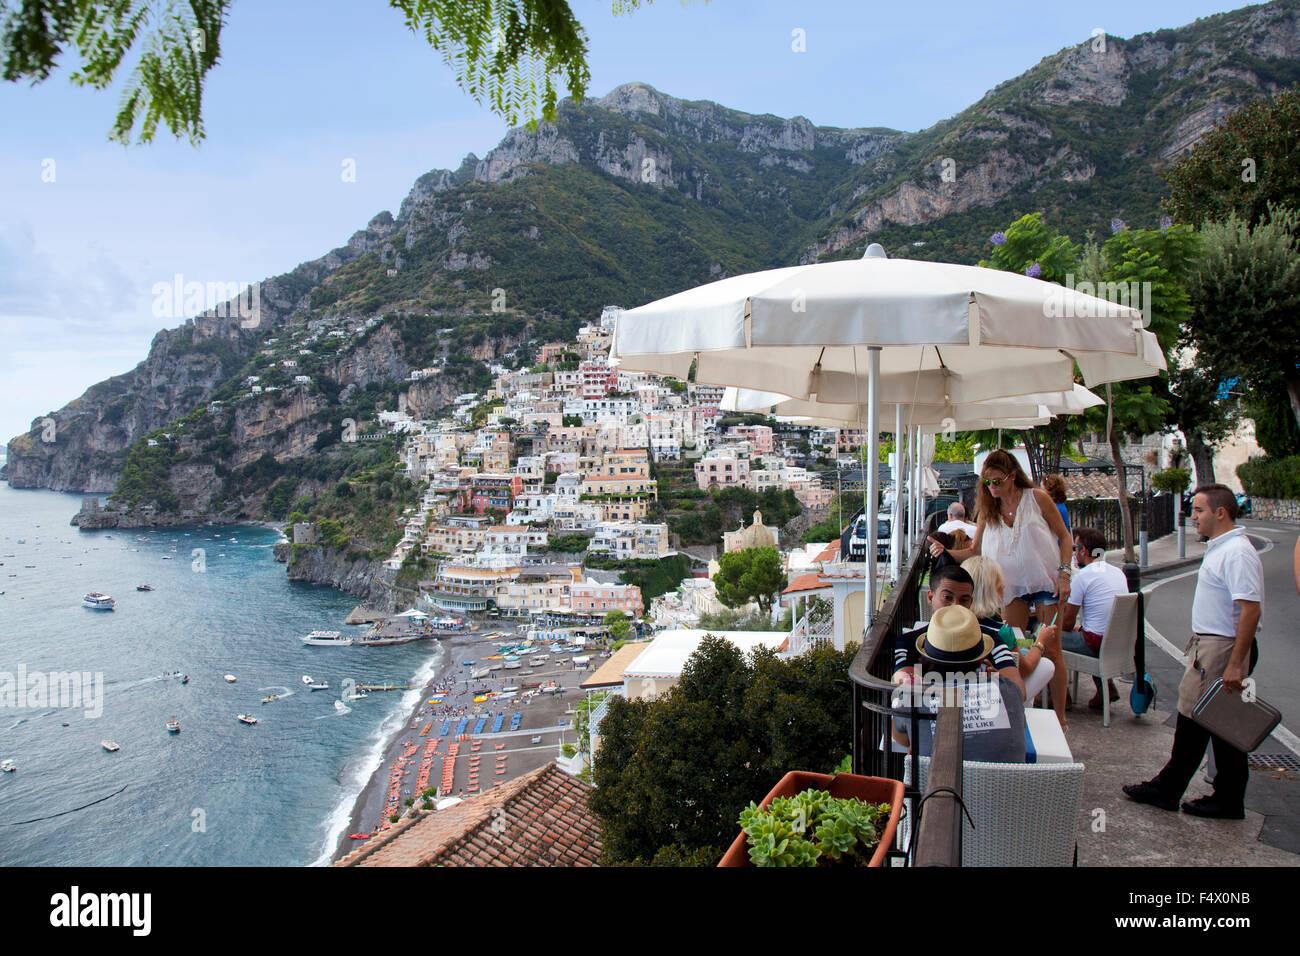 Amalfi Coast Cafe Stock Photos Amalfi Coast Cafe Stock